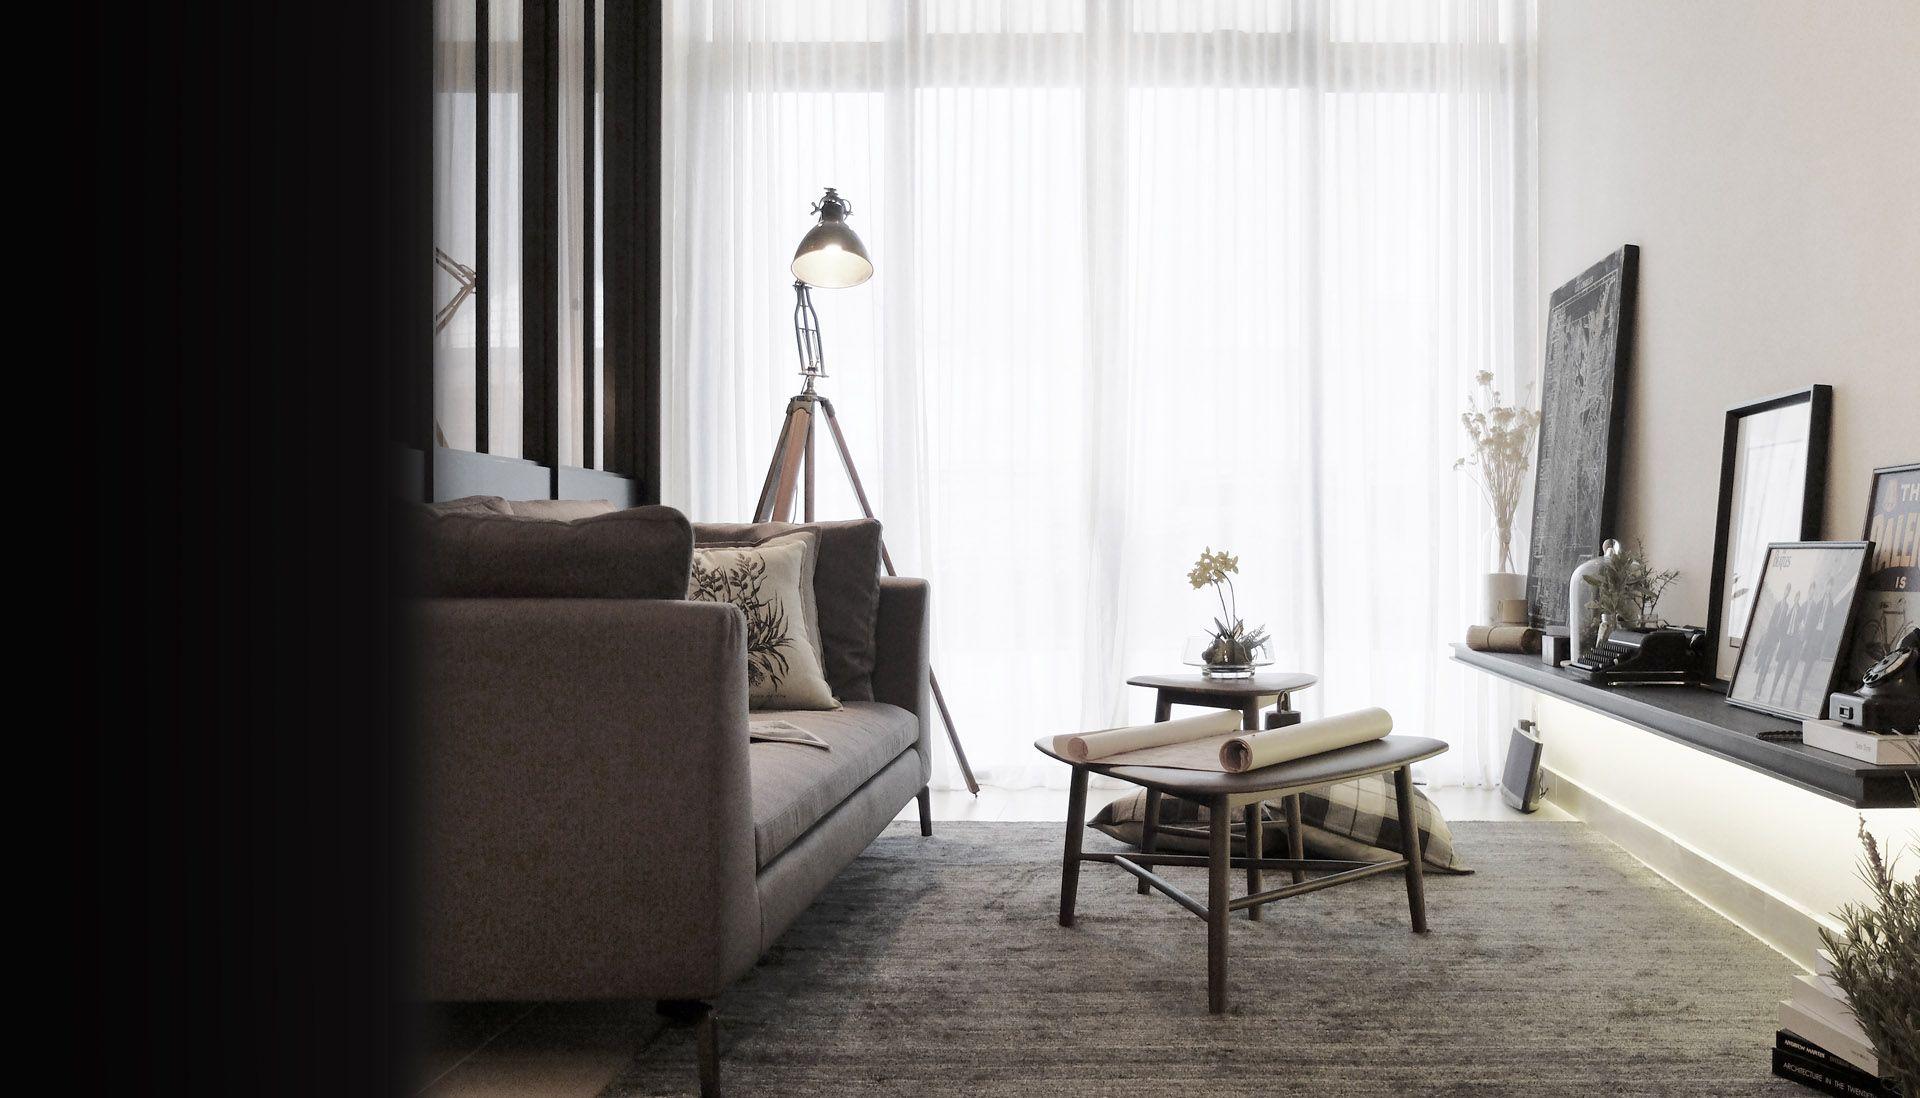 0932 singapore architectural and interior design mood in 2018